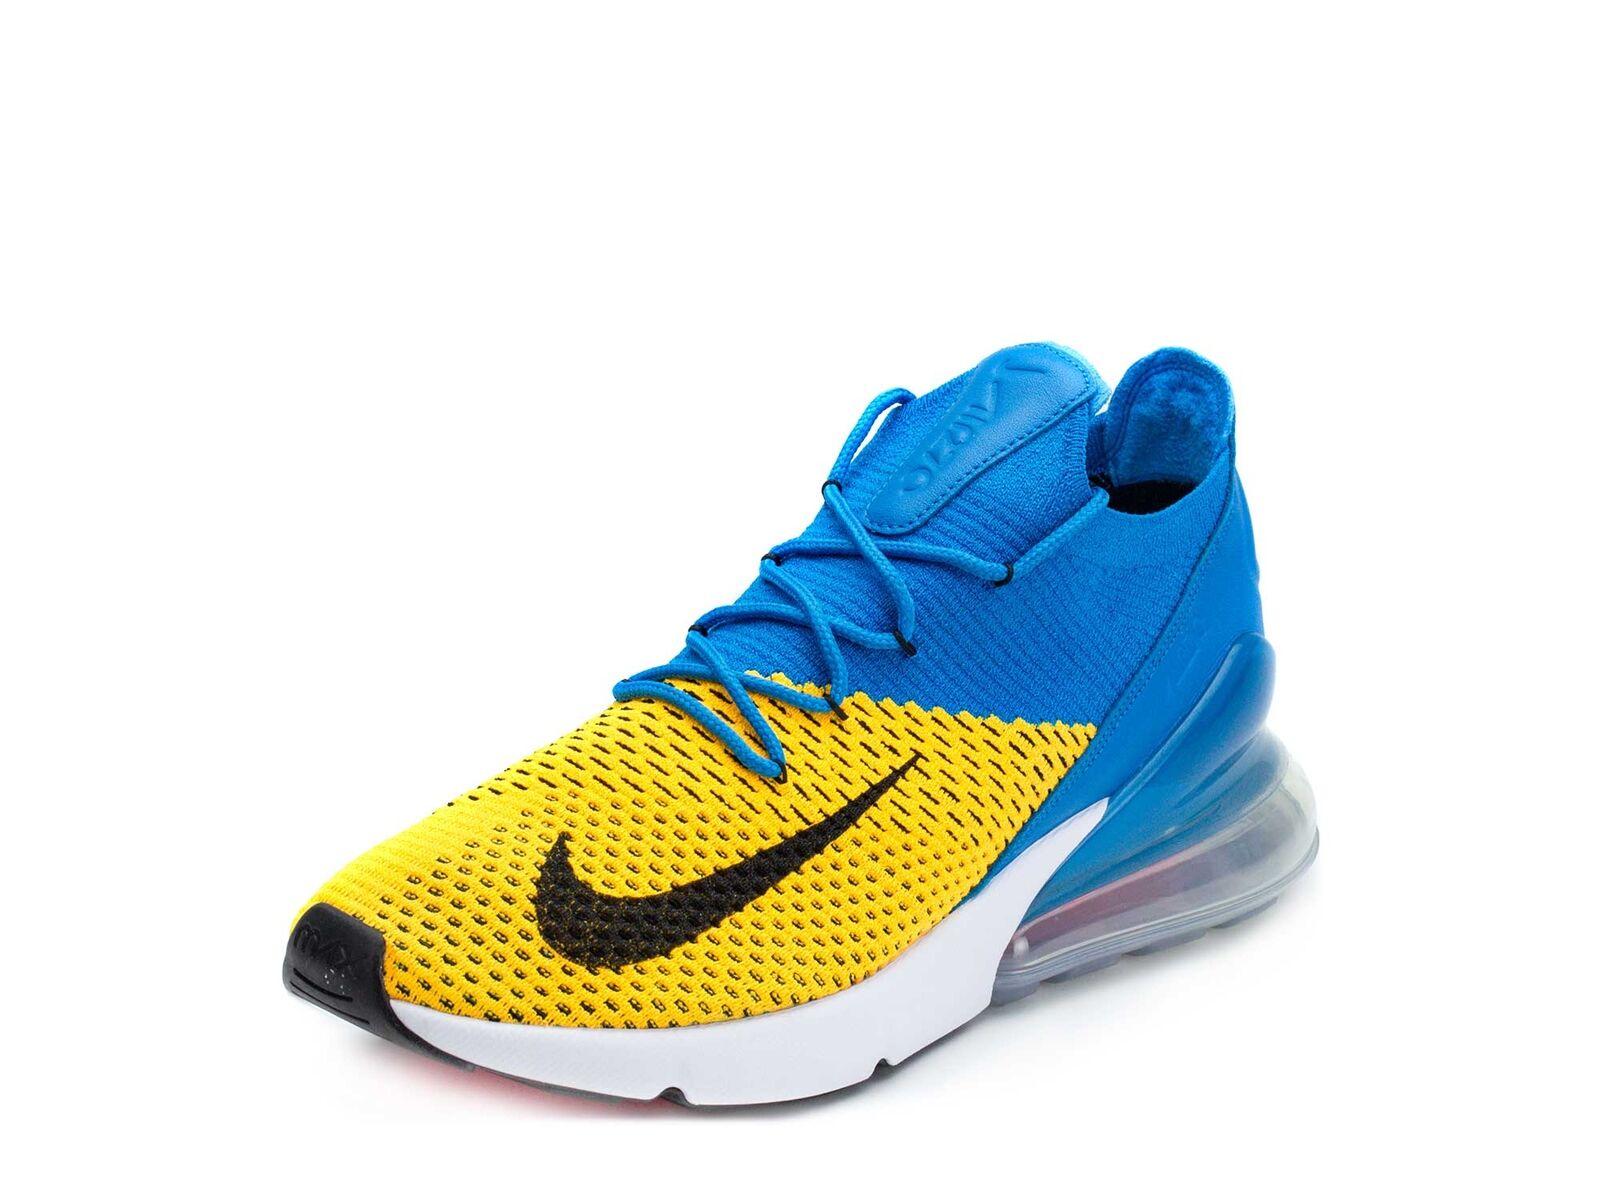 Nike Mens Air Max 270 Flyknit Laser orange bluee AO1023-800